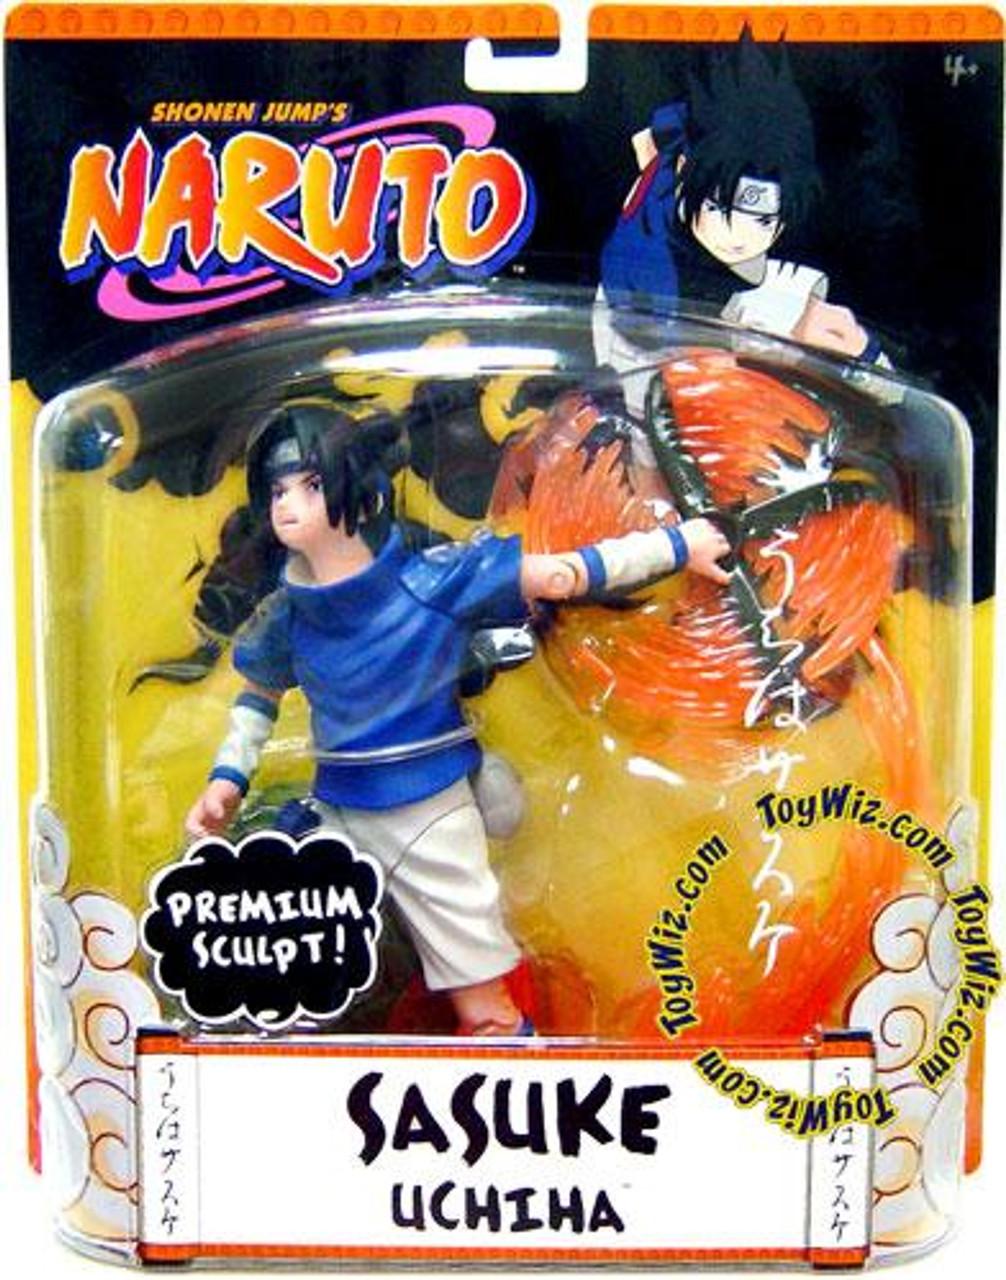 Naruto Premium Sculpt Sasuke Action Figure